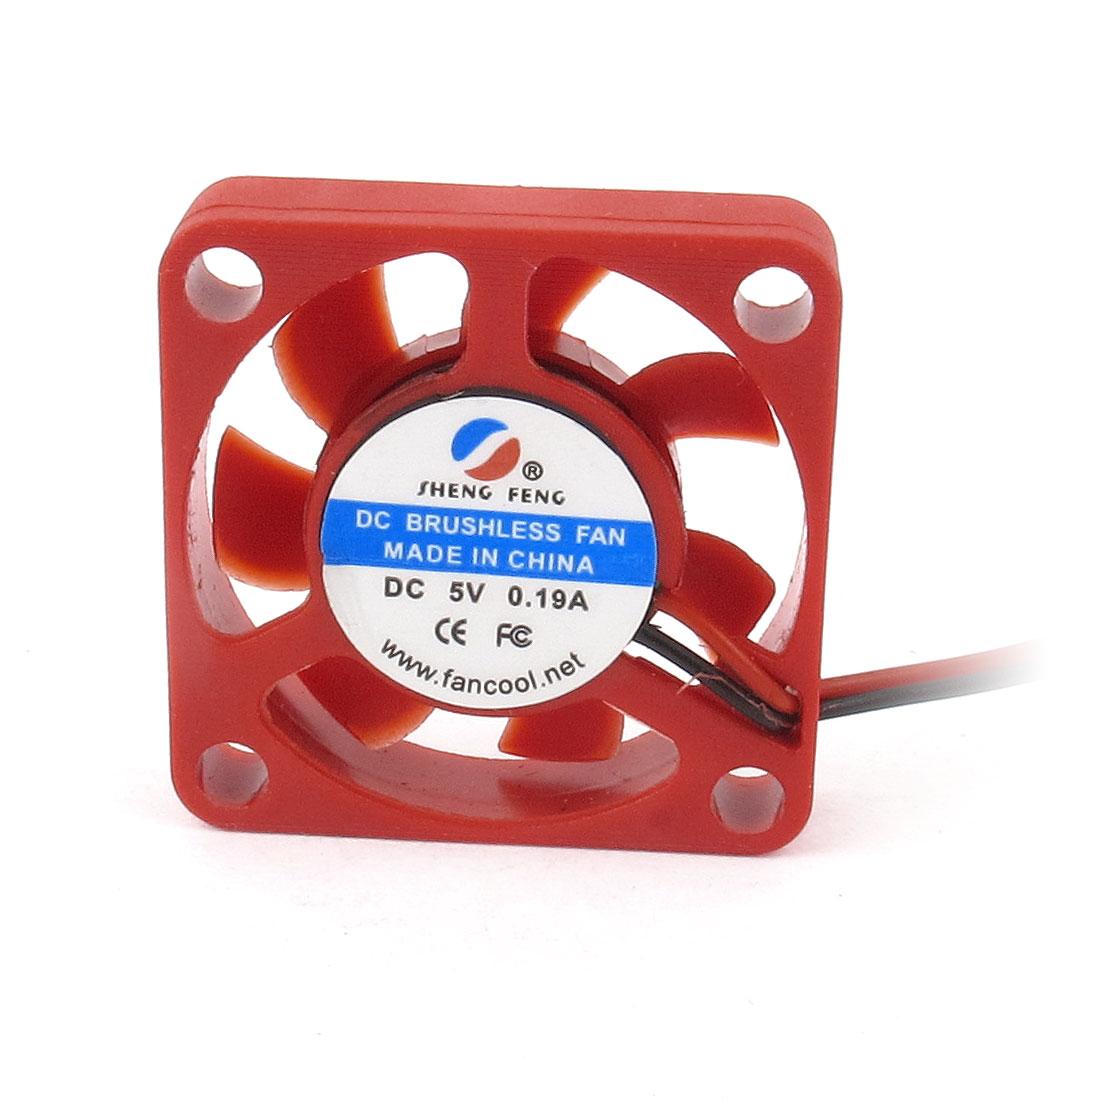 DC5V 0.19A 30mm x 30mm x 7mm Brushless Heatsink Cooler DC Cooling Fan